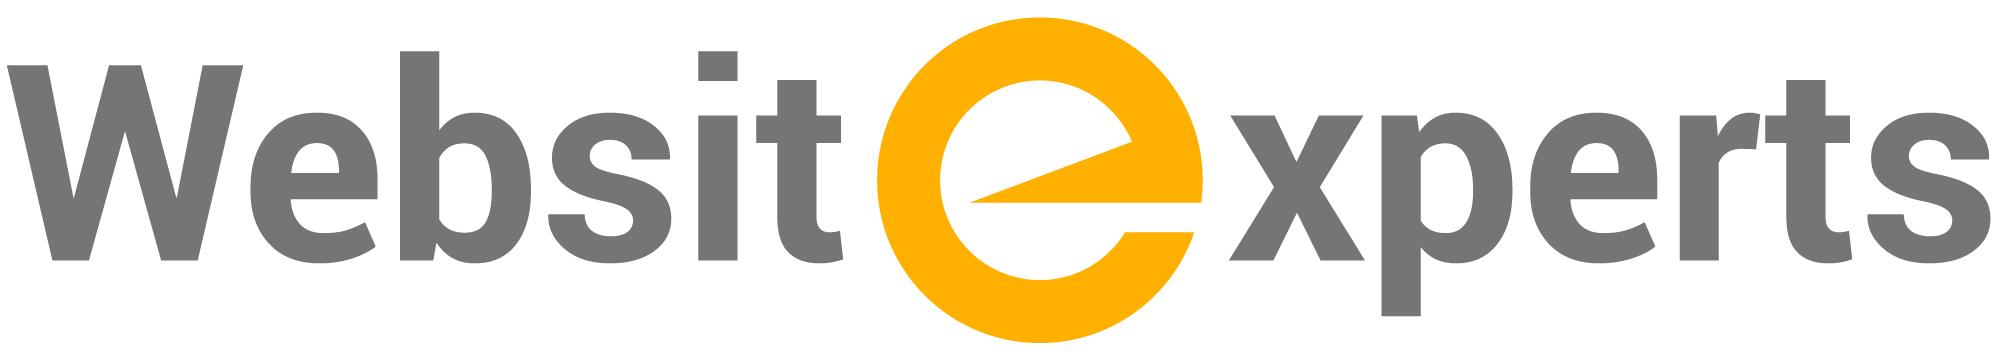 Websitexperts-Logo